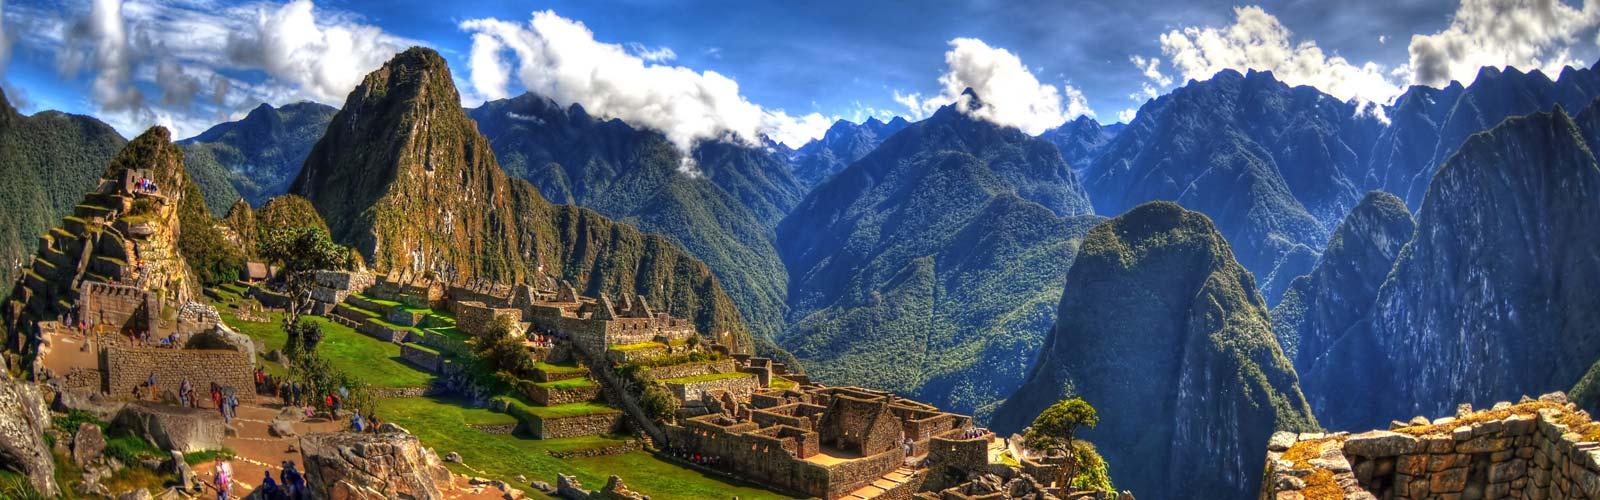 Machu Picchu - join Astra for a magical retreat to Peru